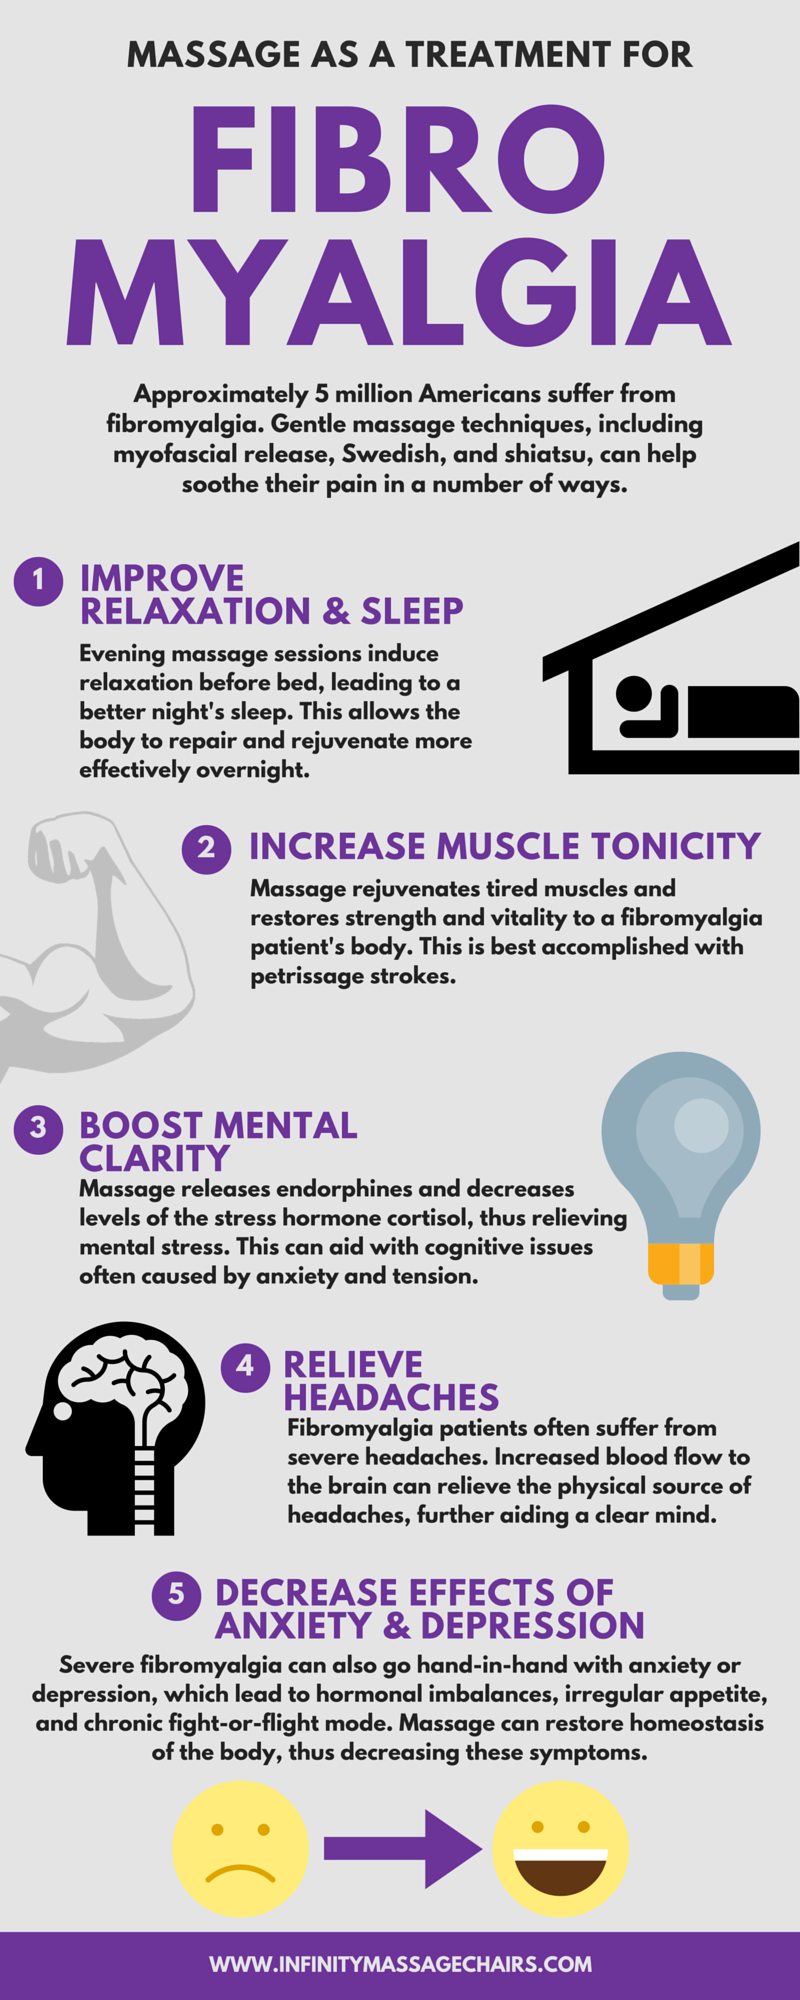 Massage for Fibromyalgia Infographic